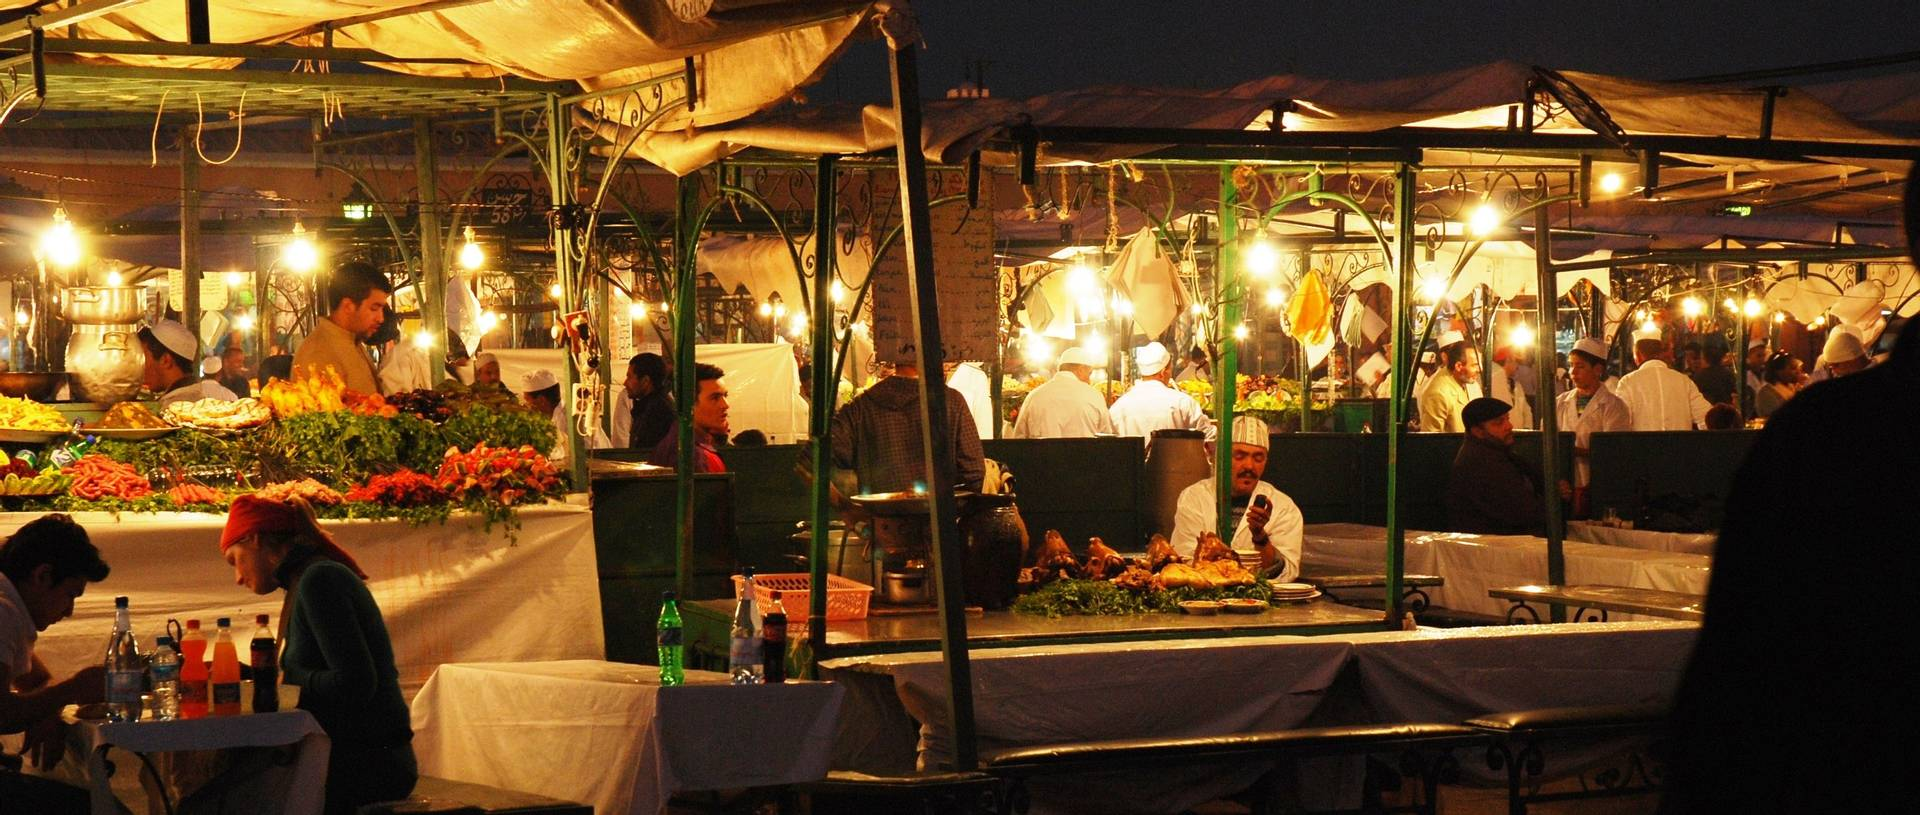 Night Market,Ania